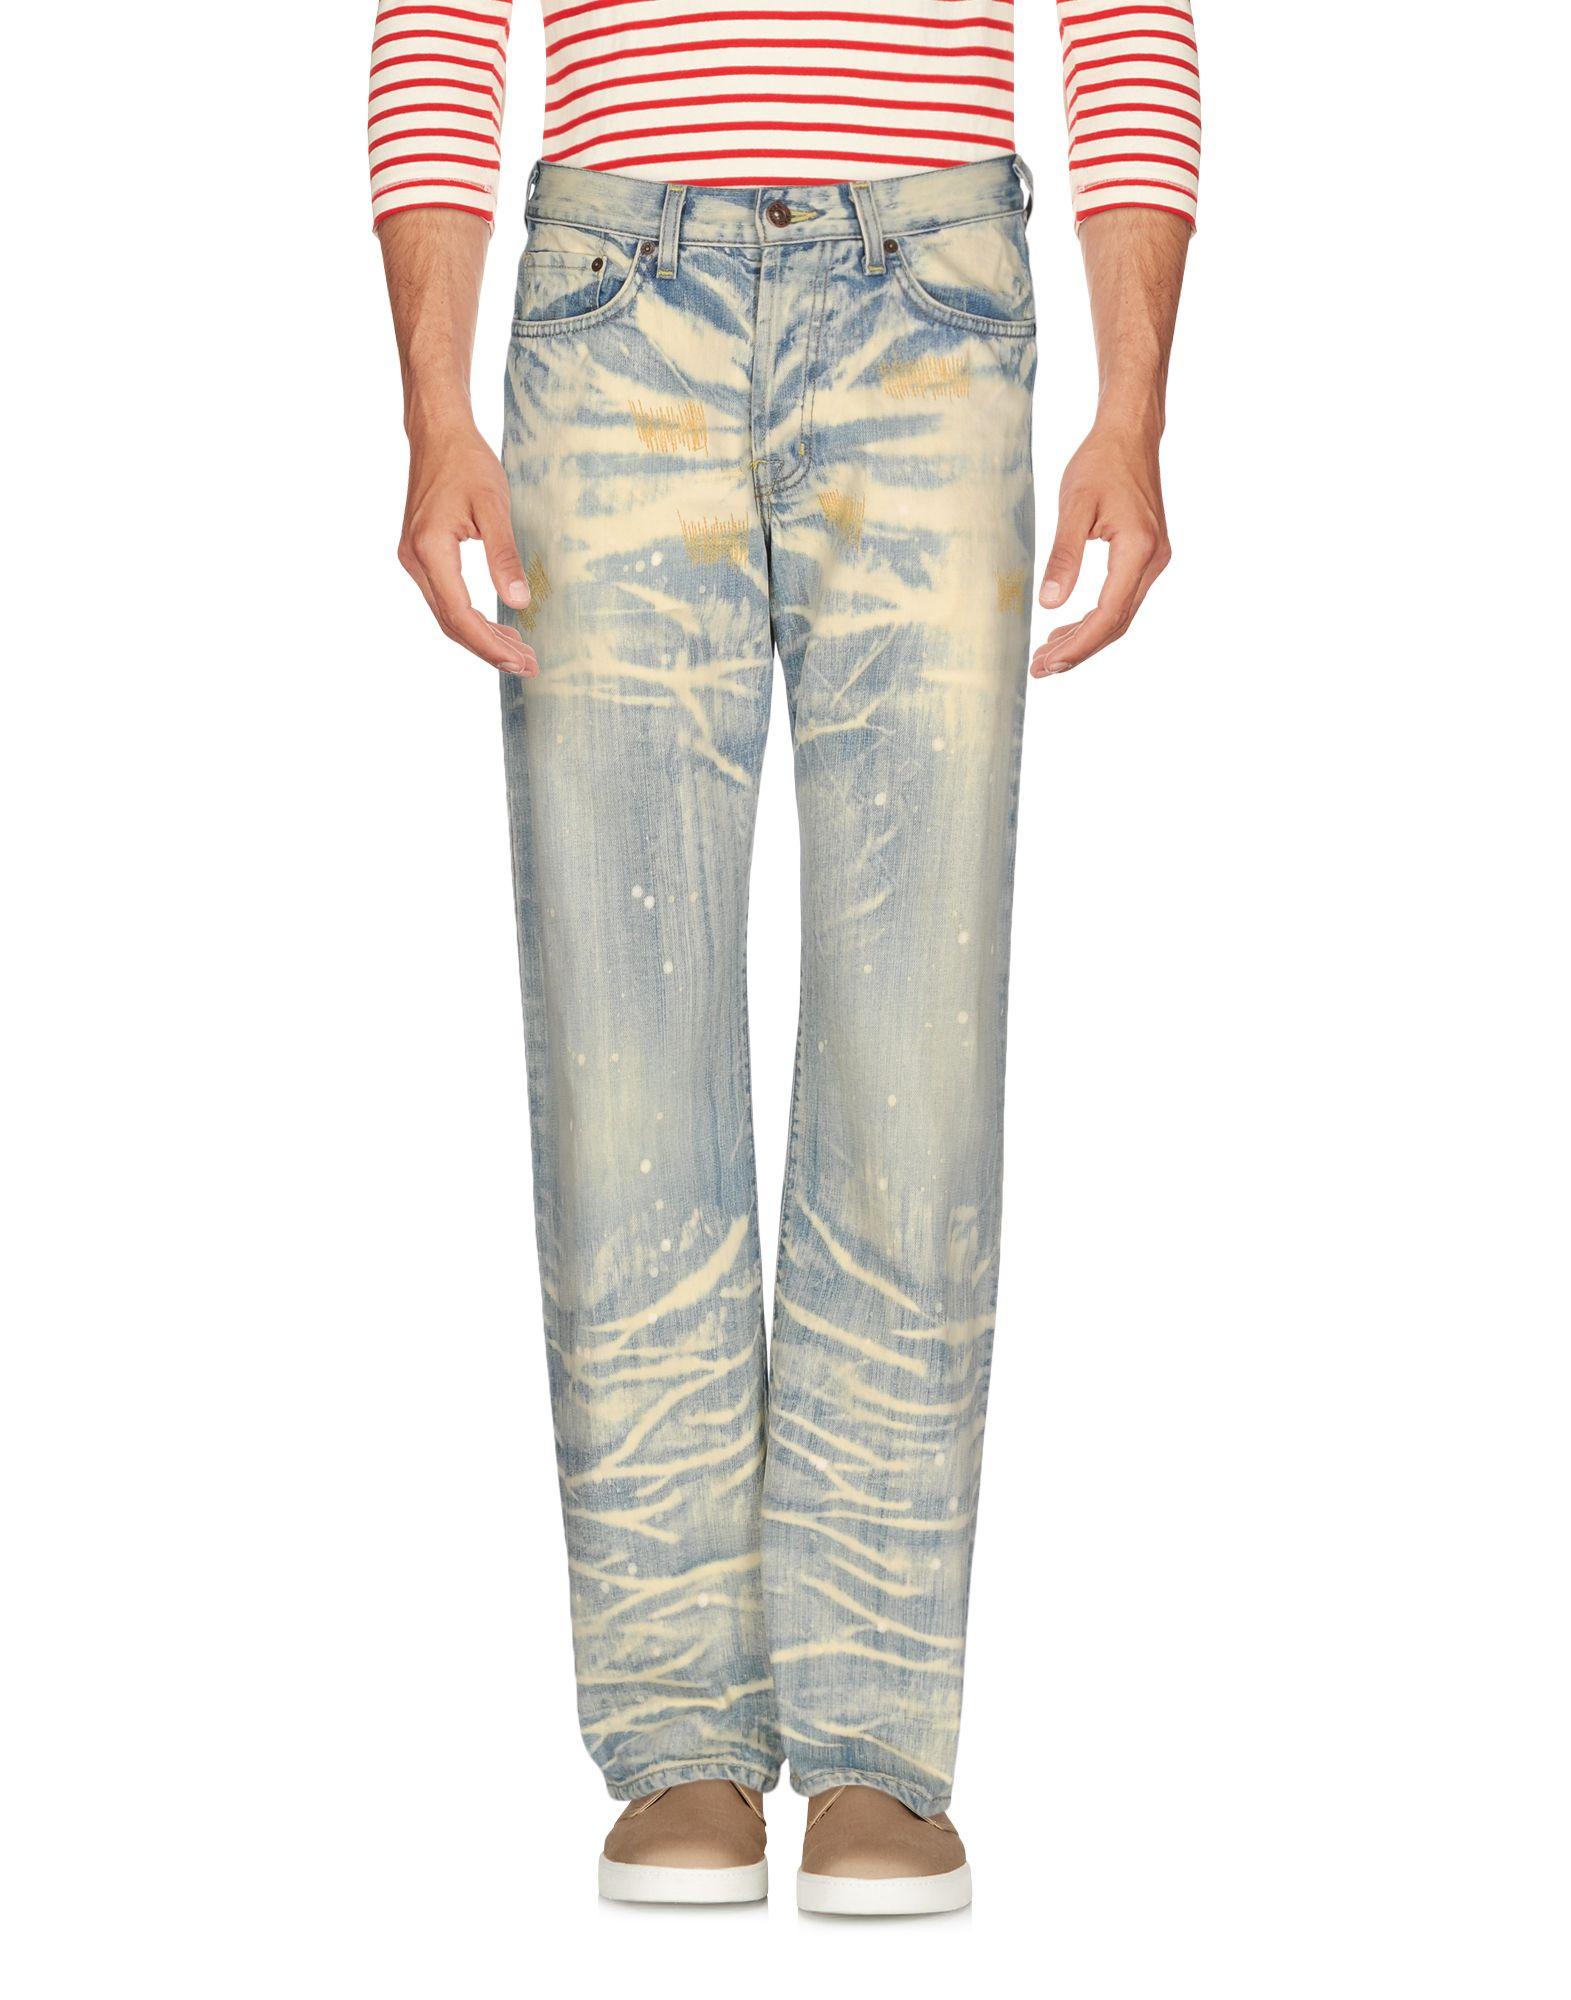 VON DUTCH Джинсовые брюки для губ maybelline new york color drama lip contour palette 01 цвет 01 crimson vixen variant hex name d70728